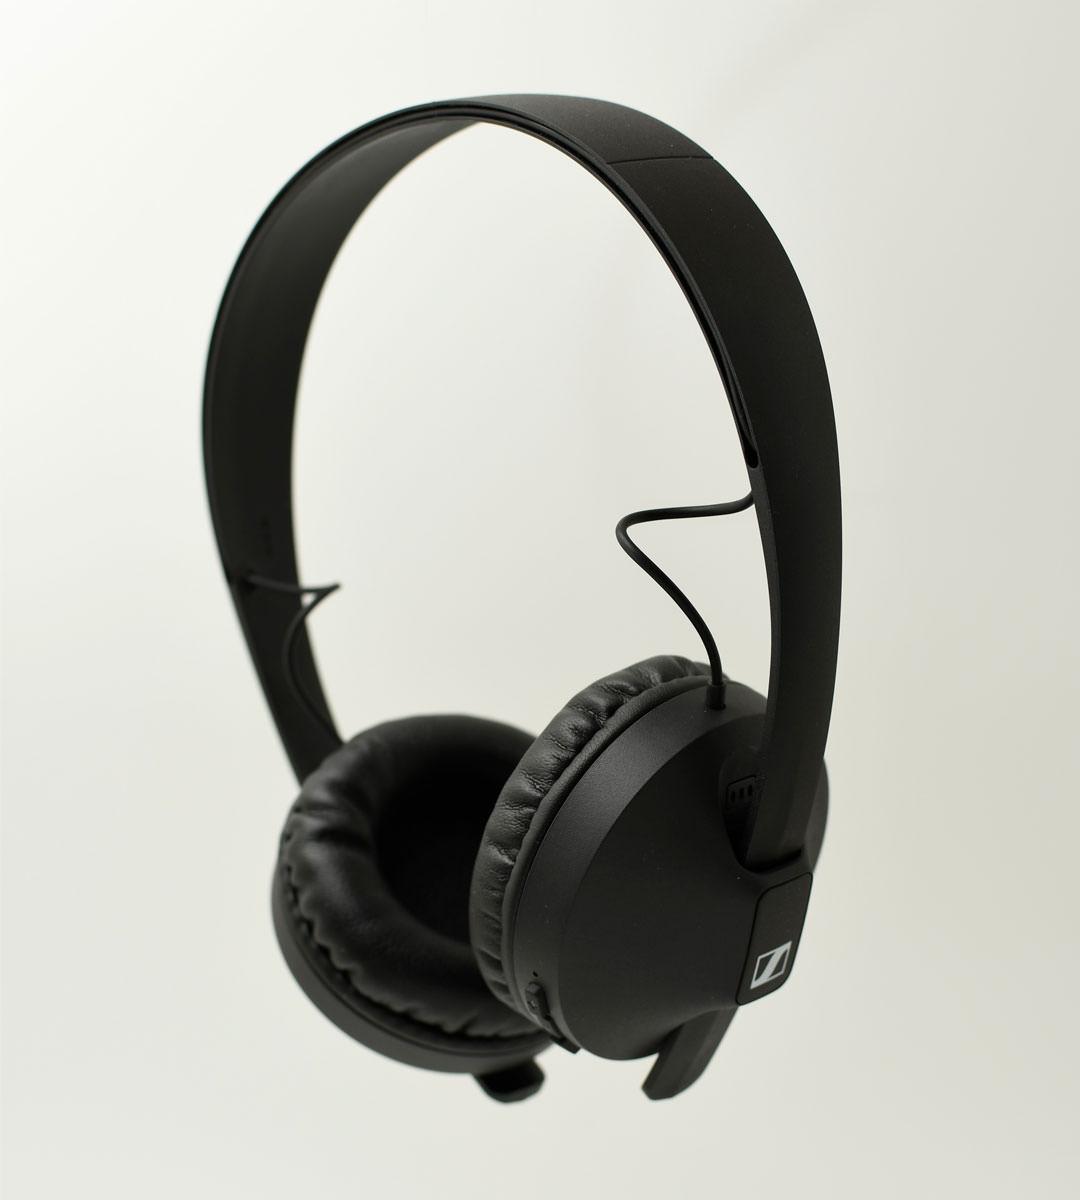 HD250BT review